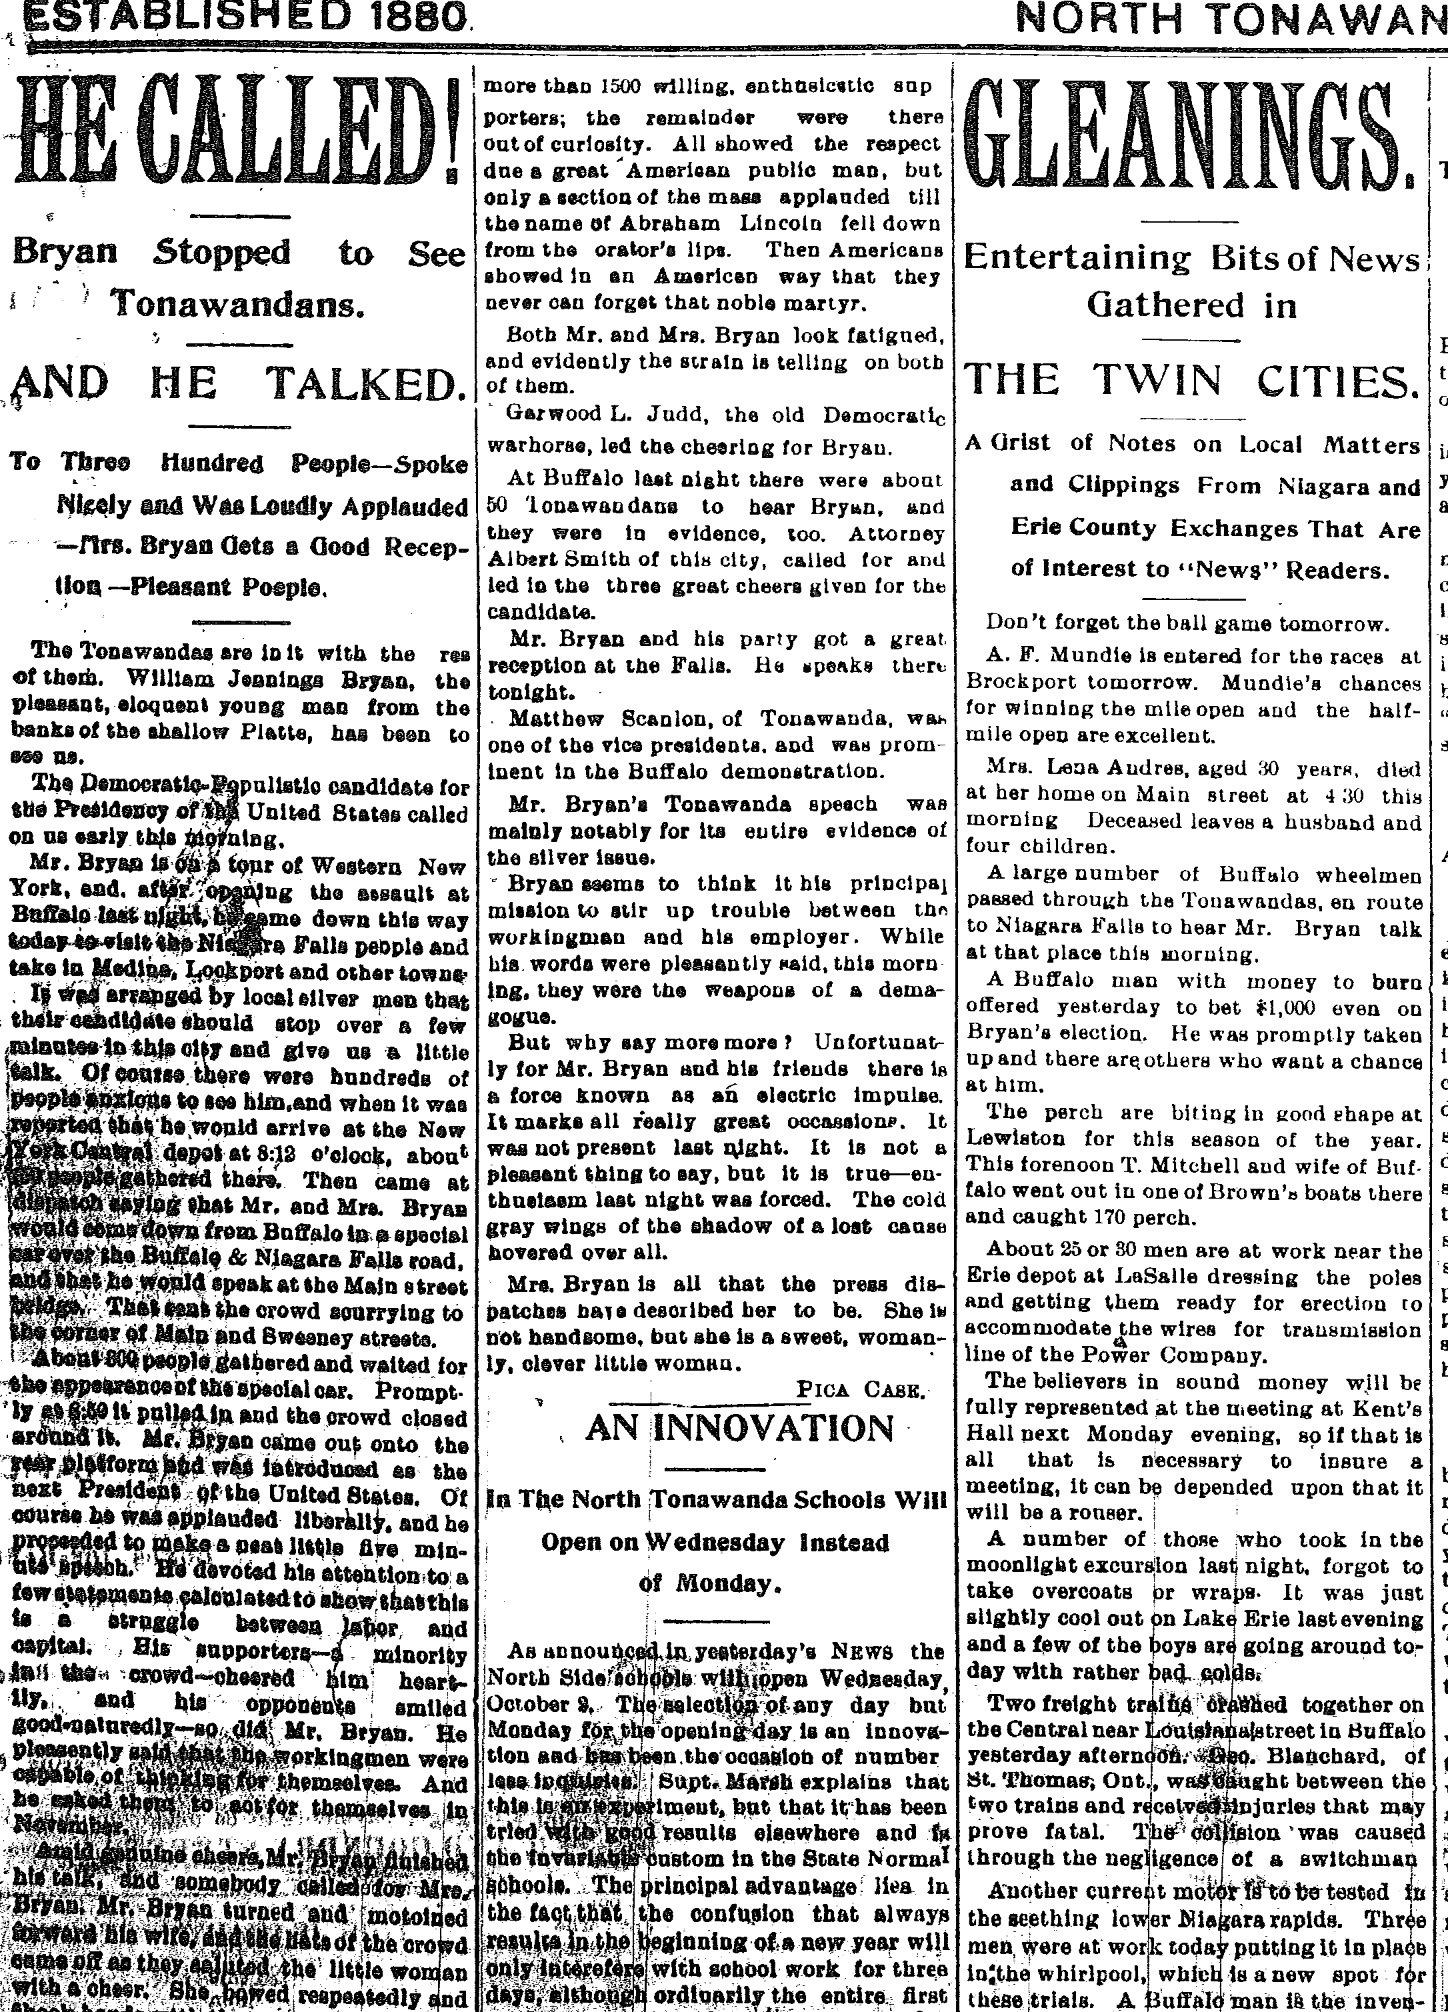 He Called, William Jennings Bryan visits Tonawandas, article (Tonawanda News, 1896-05-16).jpg